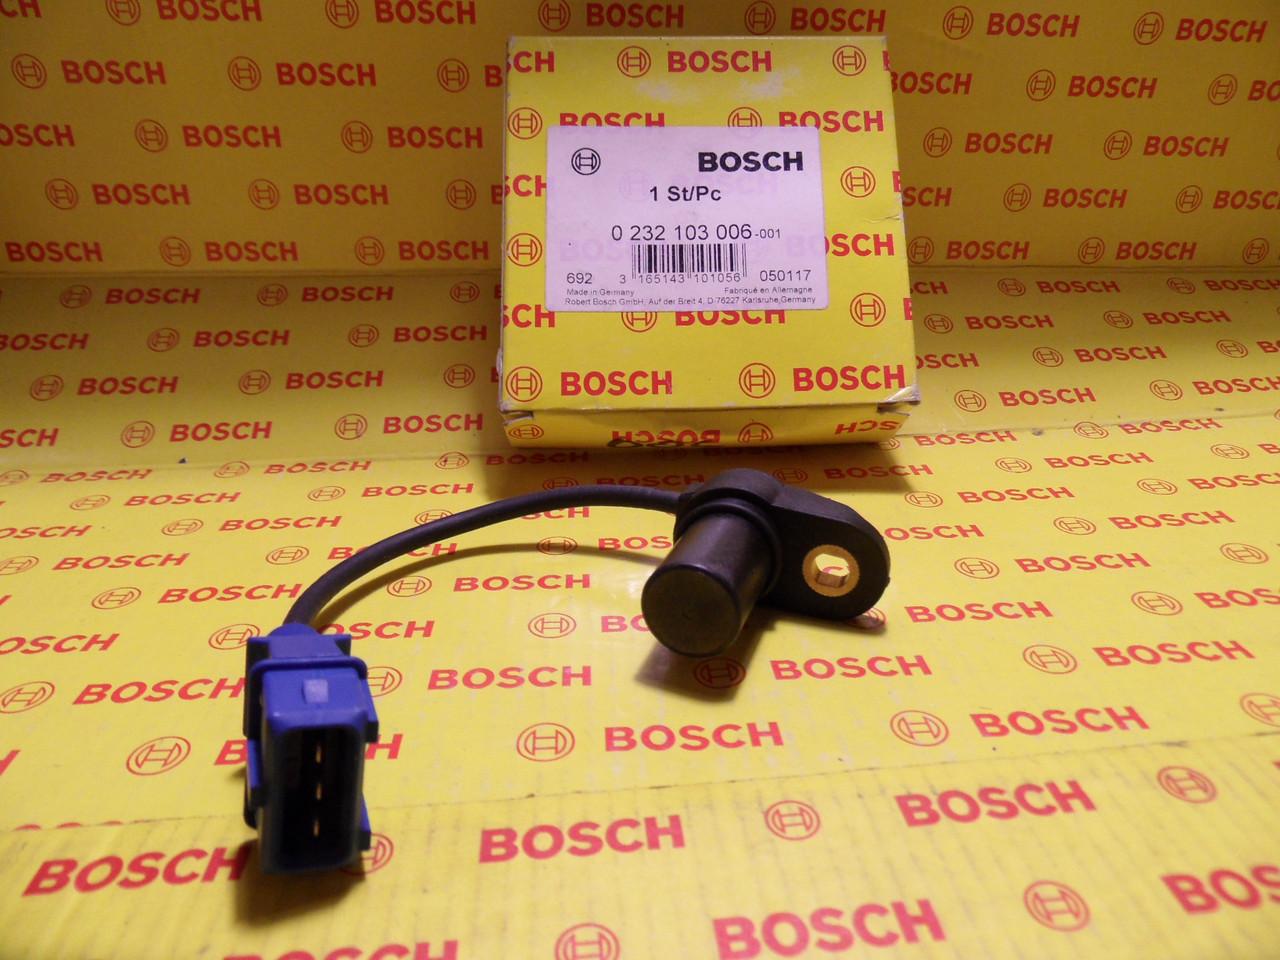 Датчики BOSCH, 0232103006, 0232103 006